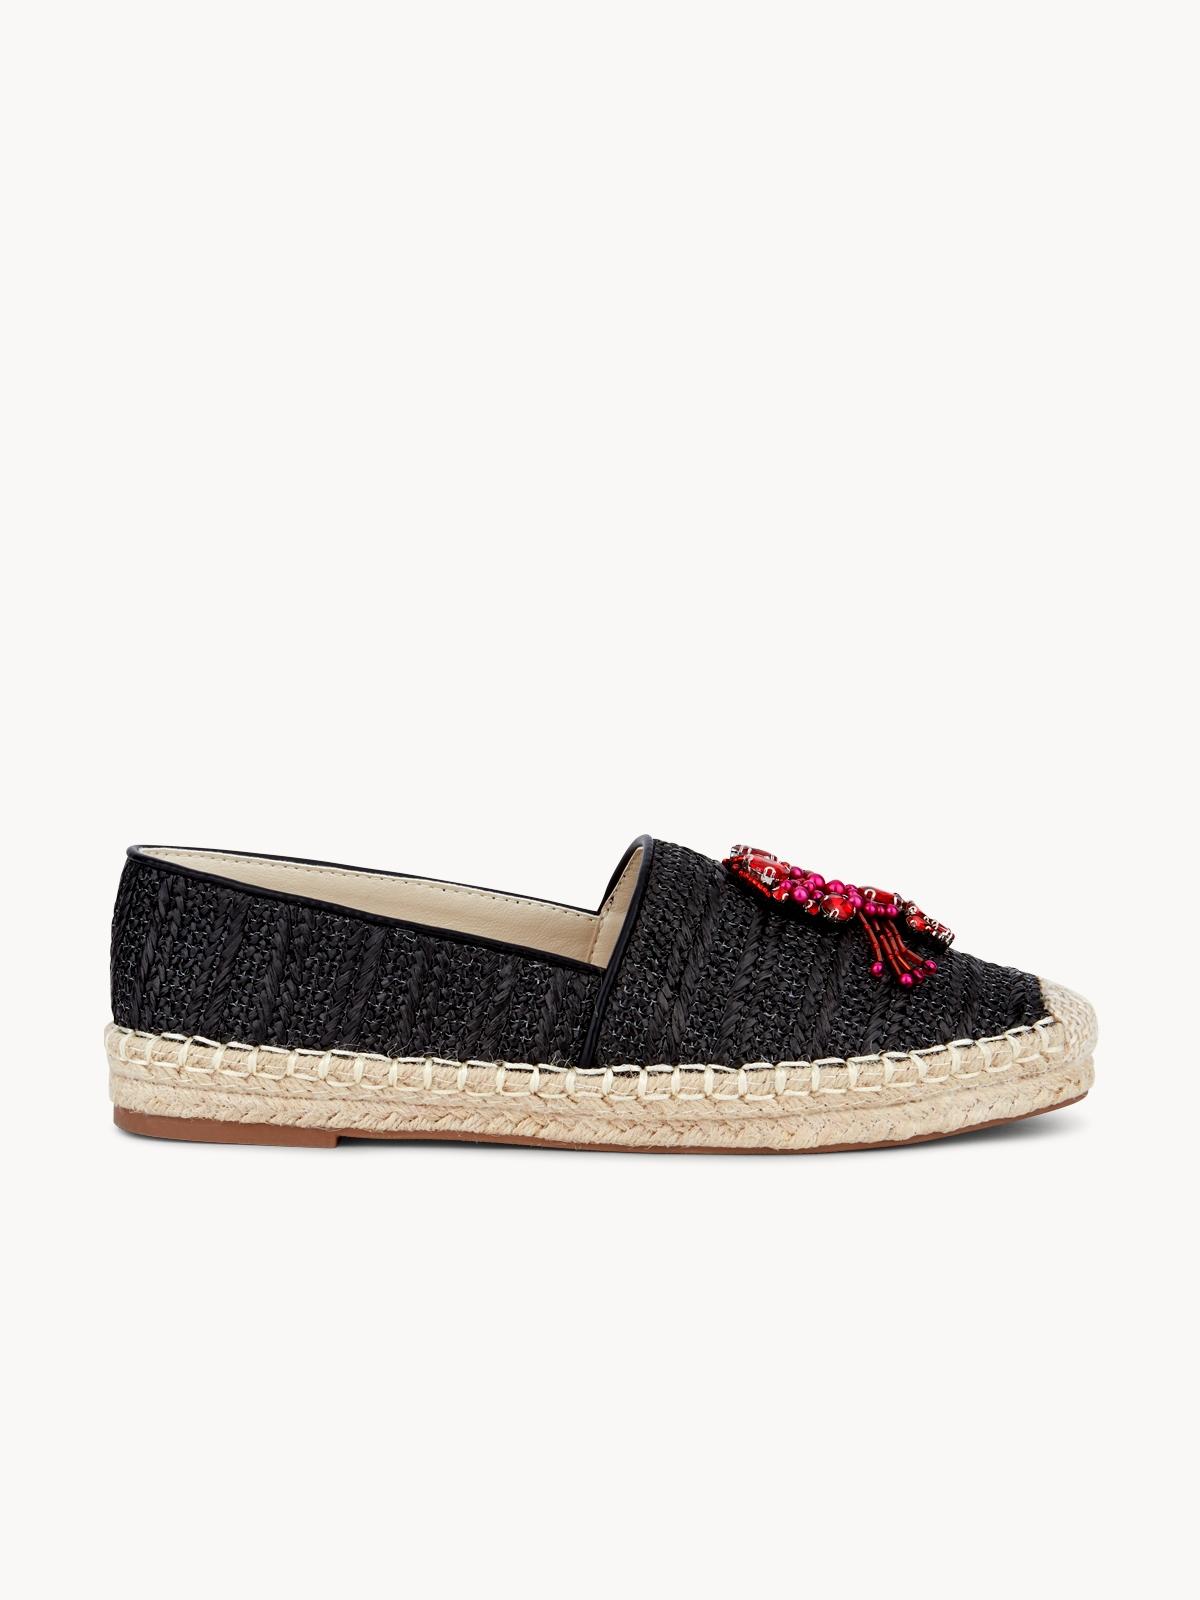 March Shoes Lobster Espadrilles Black